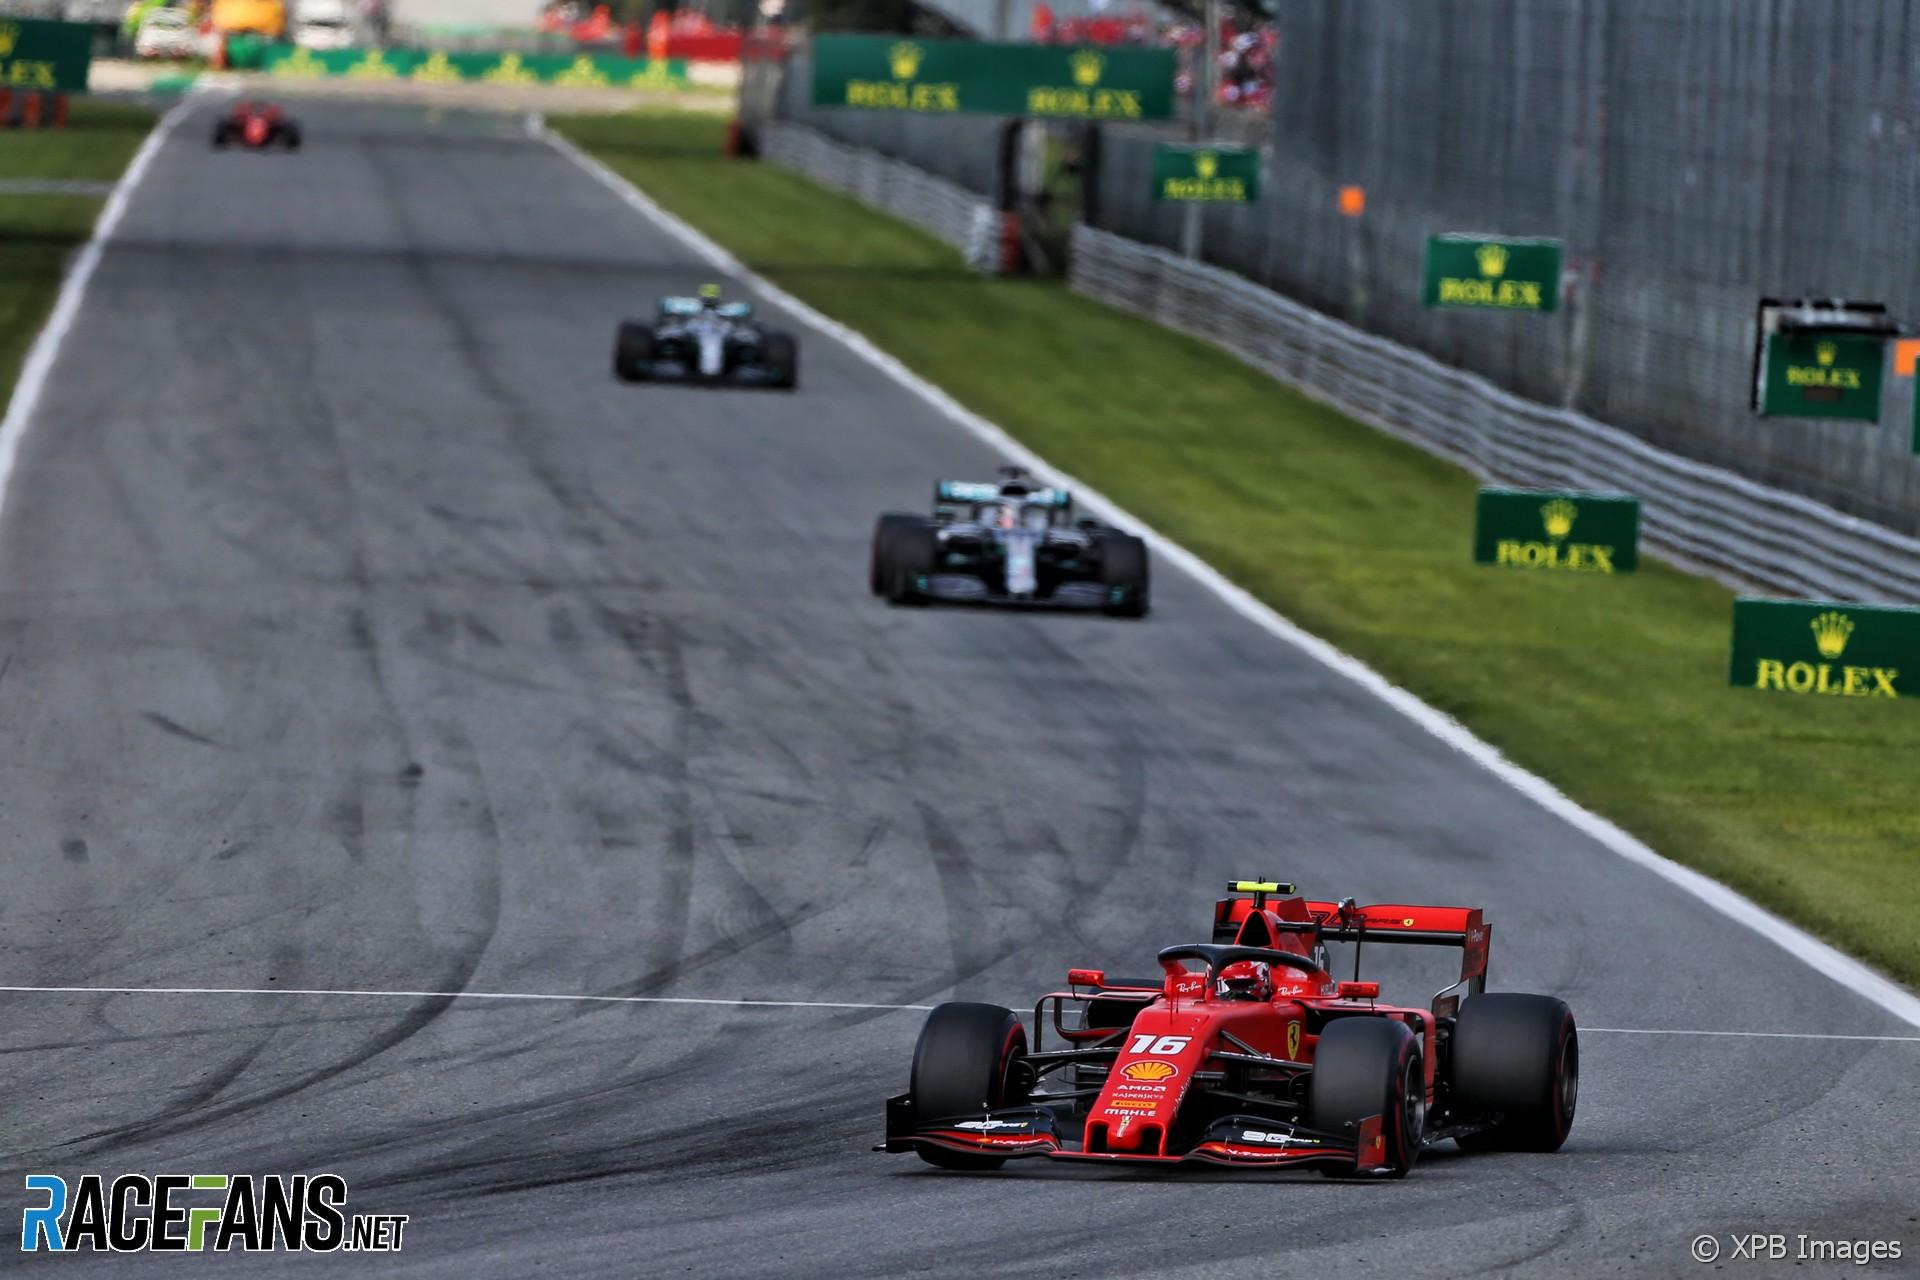 Charles Leclerc, Ferrari, Monza, 2019